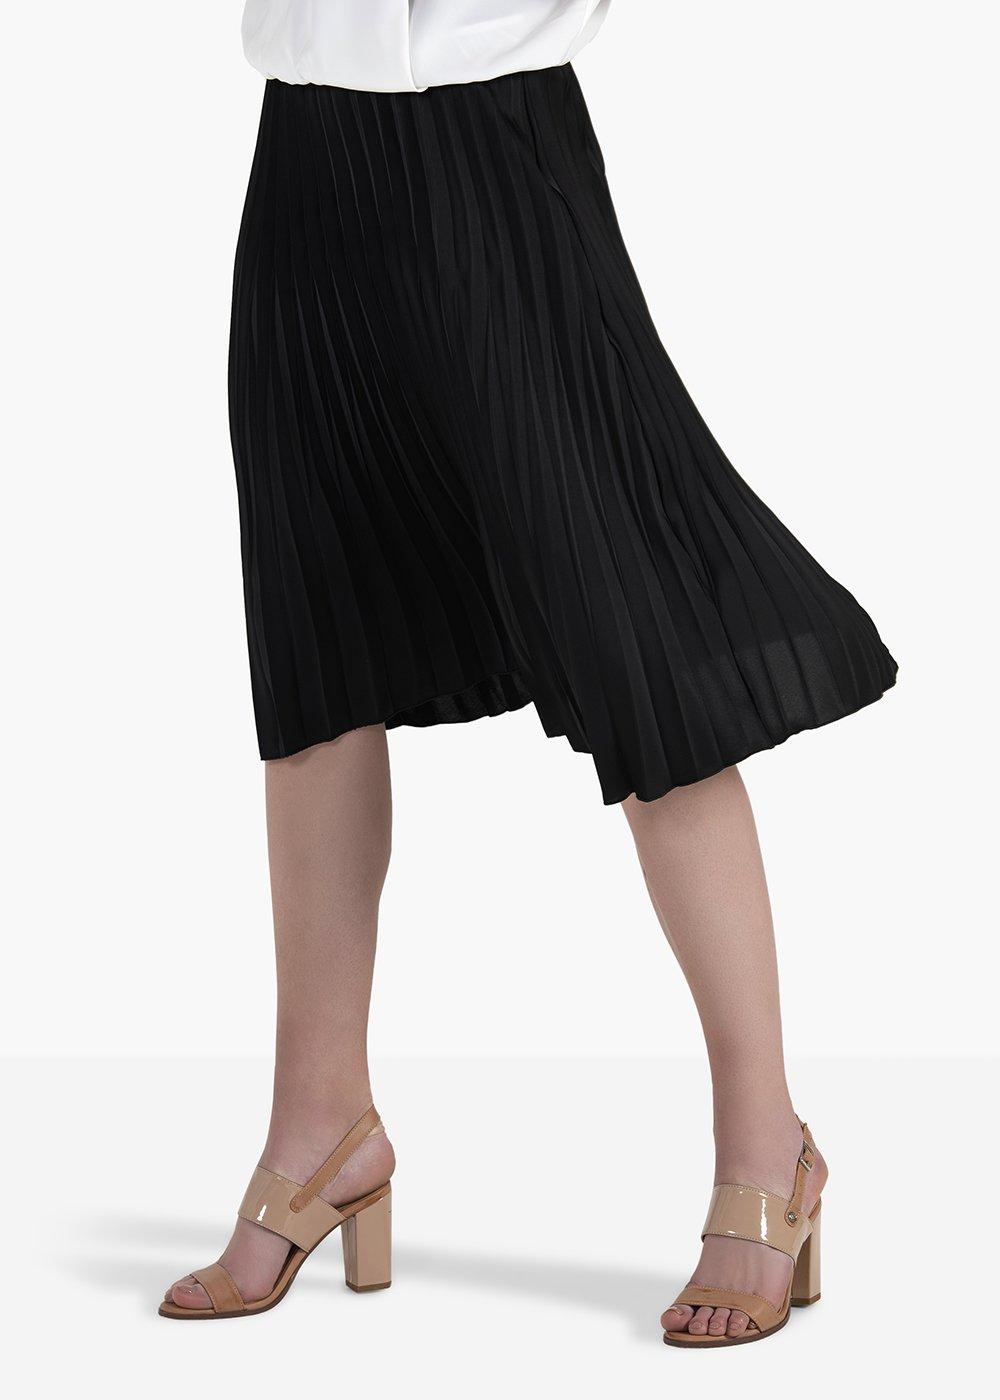 Ginevre pleated skirt with elastic waistband - Black - Woman